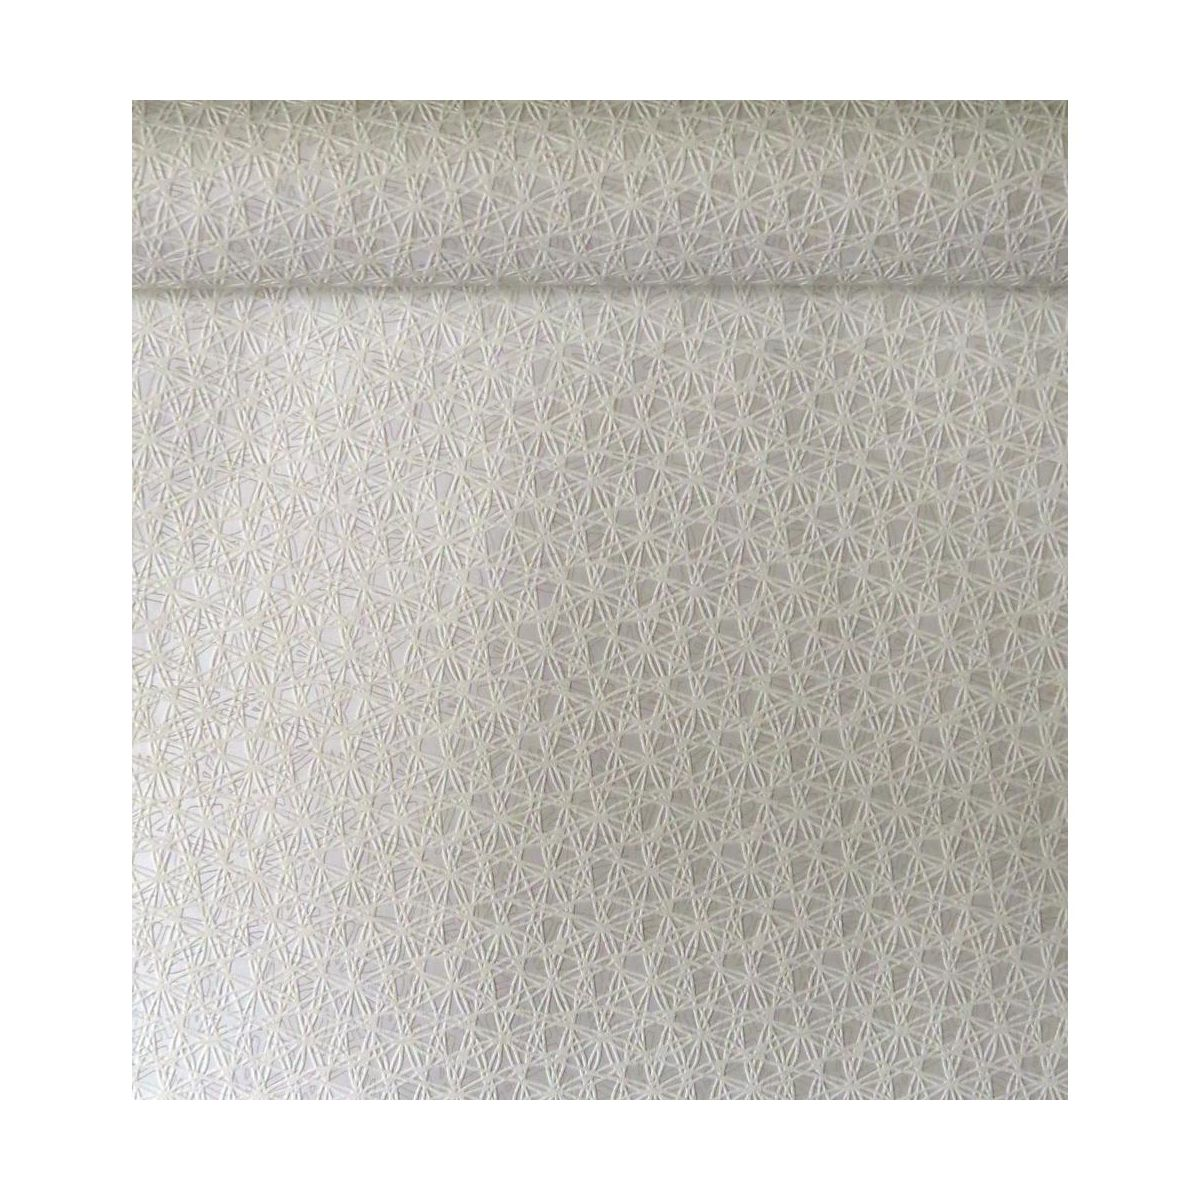 tapeta crochet bn tapety w atrakcyjnej cenie w. Black Bedroom Furniture Sets. Home Design Ideas